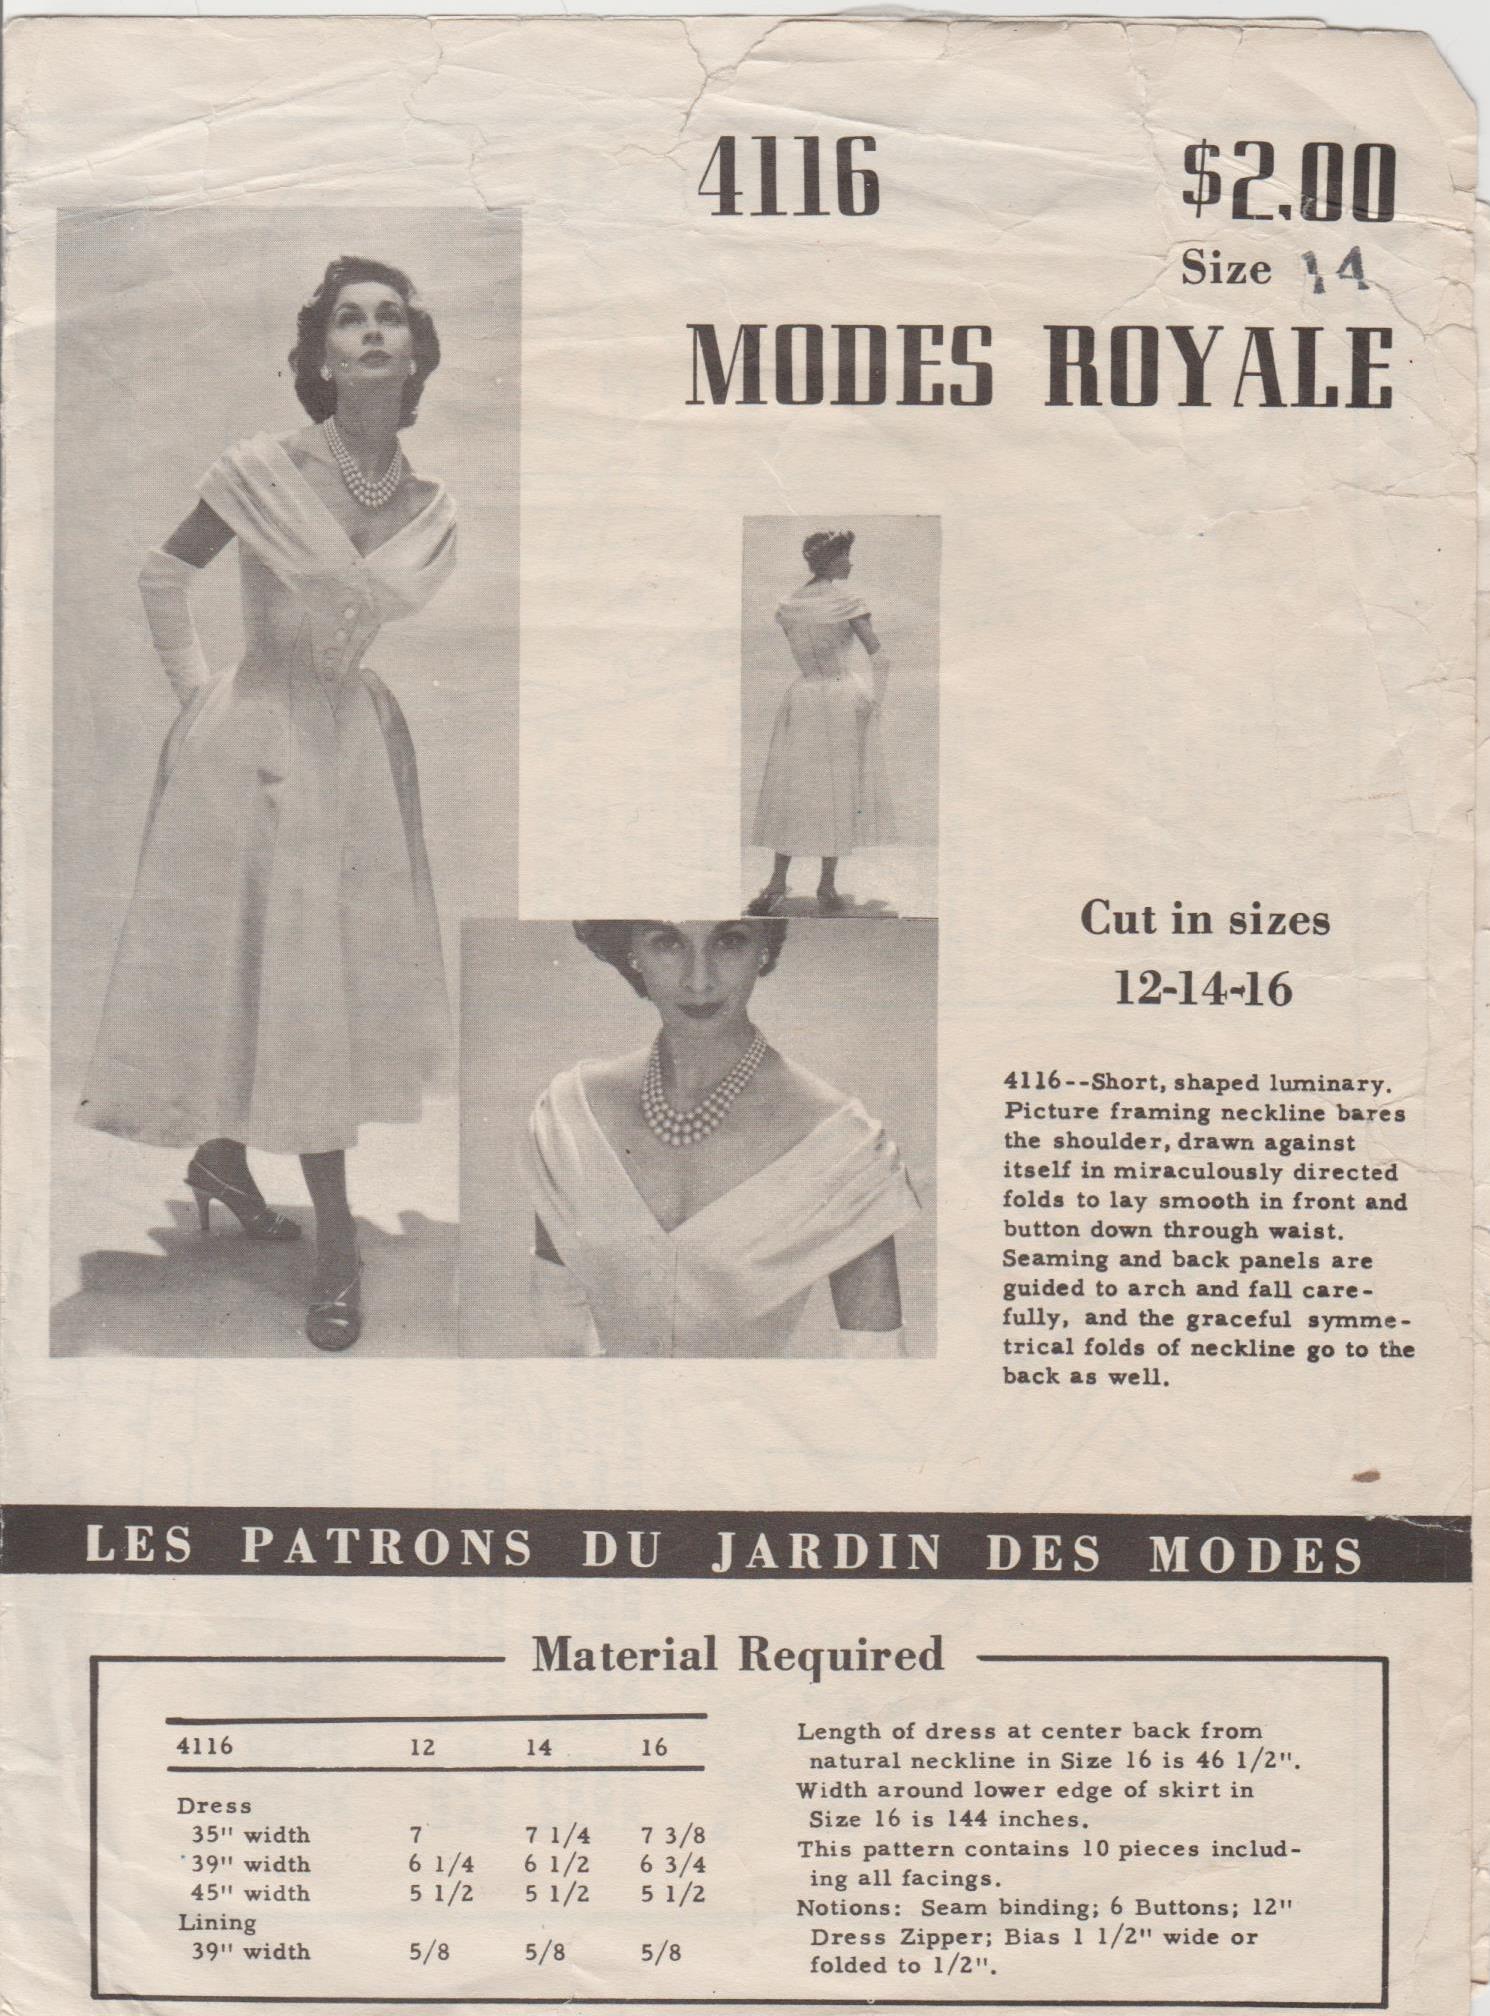 Modes Royale 4116